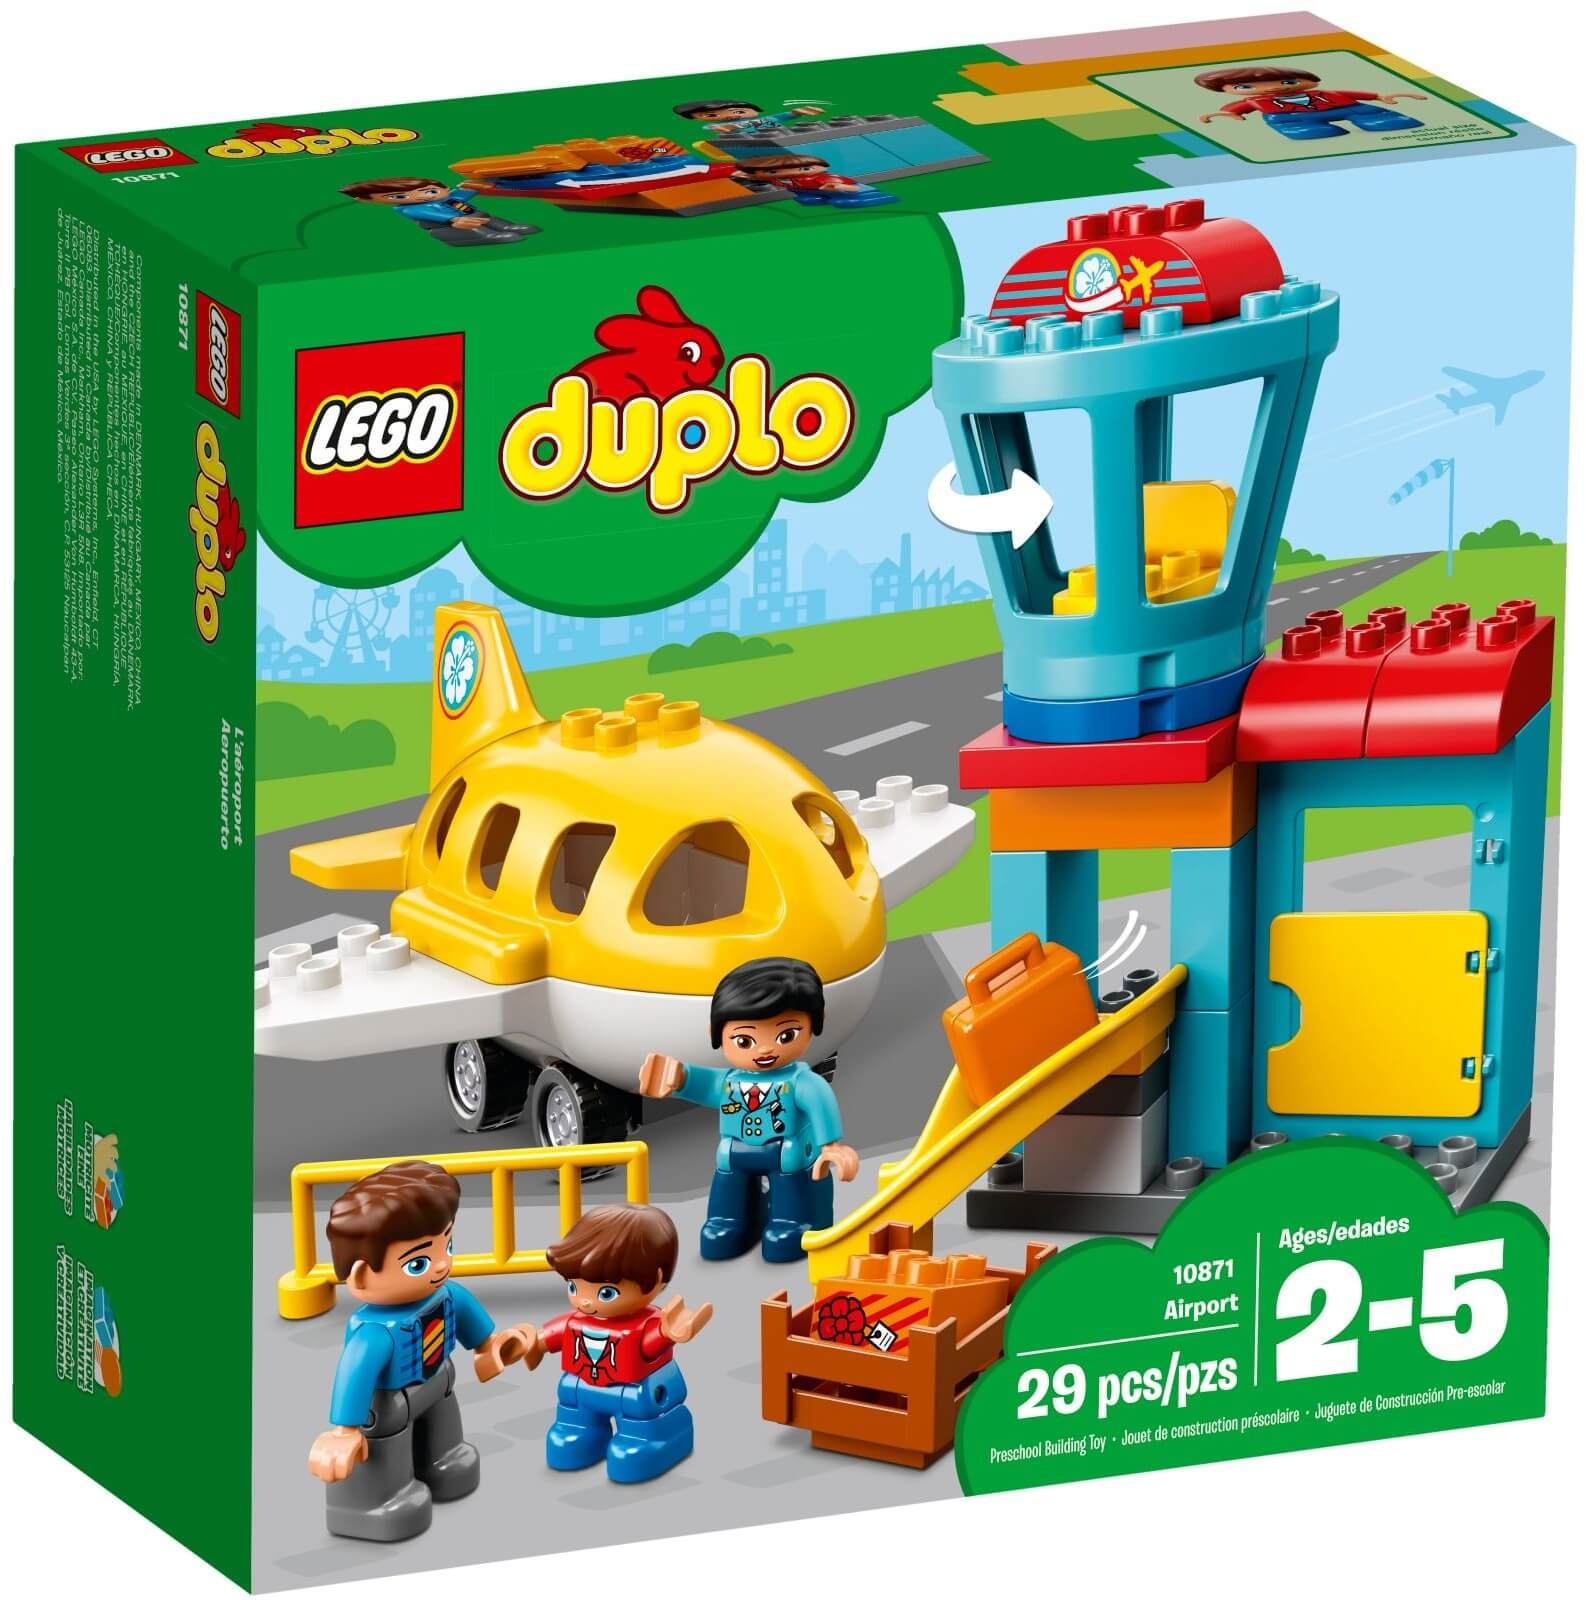 Mua đồ chơi LEGO 10871 - LEGO Duplo 10871 - Sân Bay của Bé (LEGO Duplo 10871 Airport)